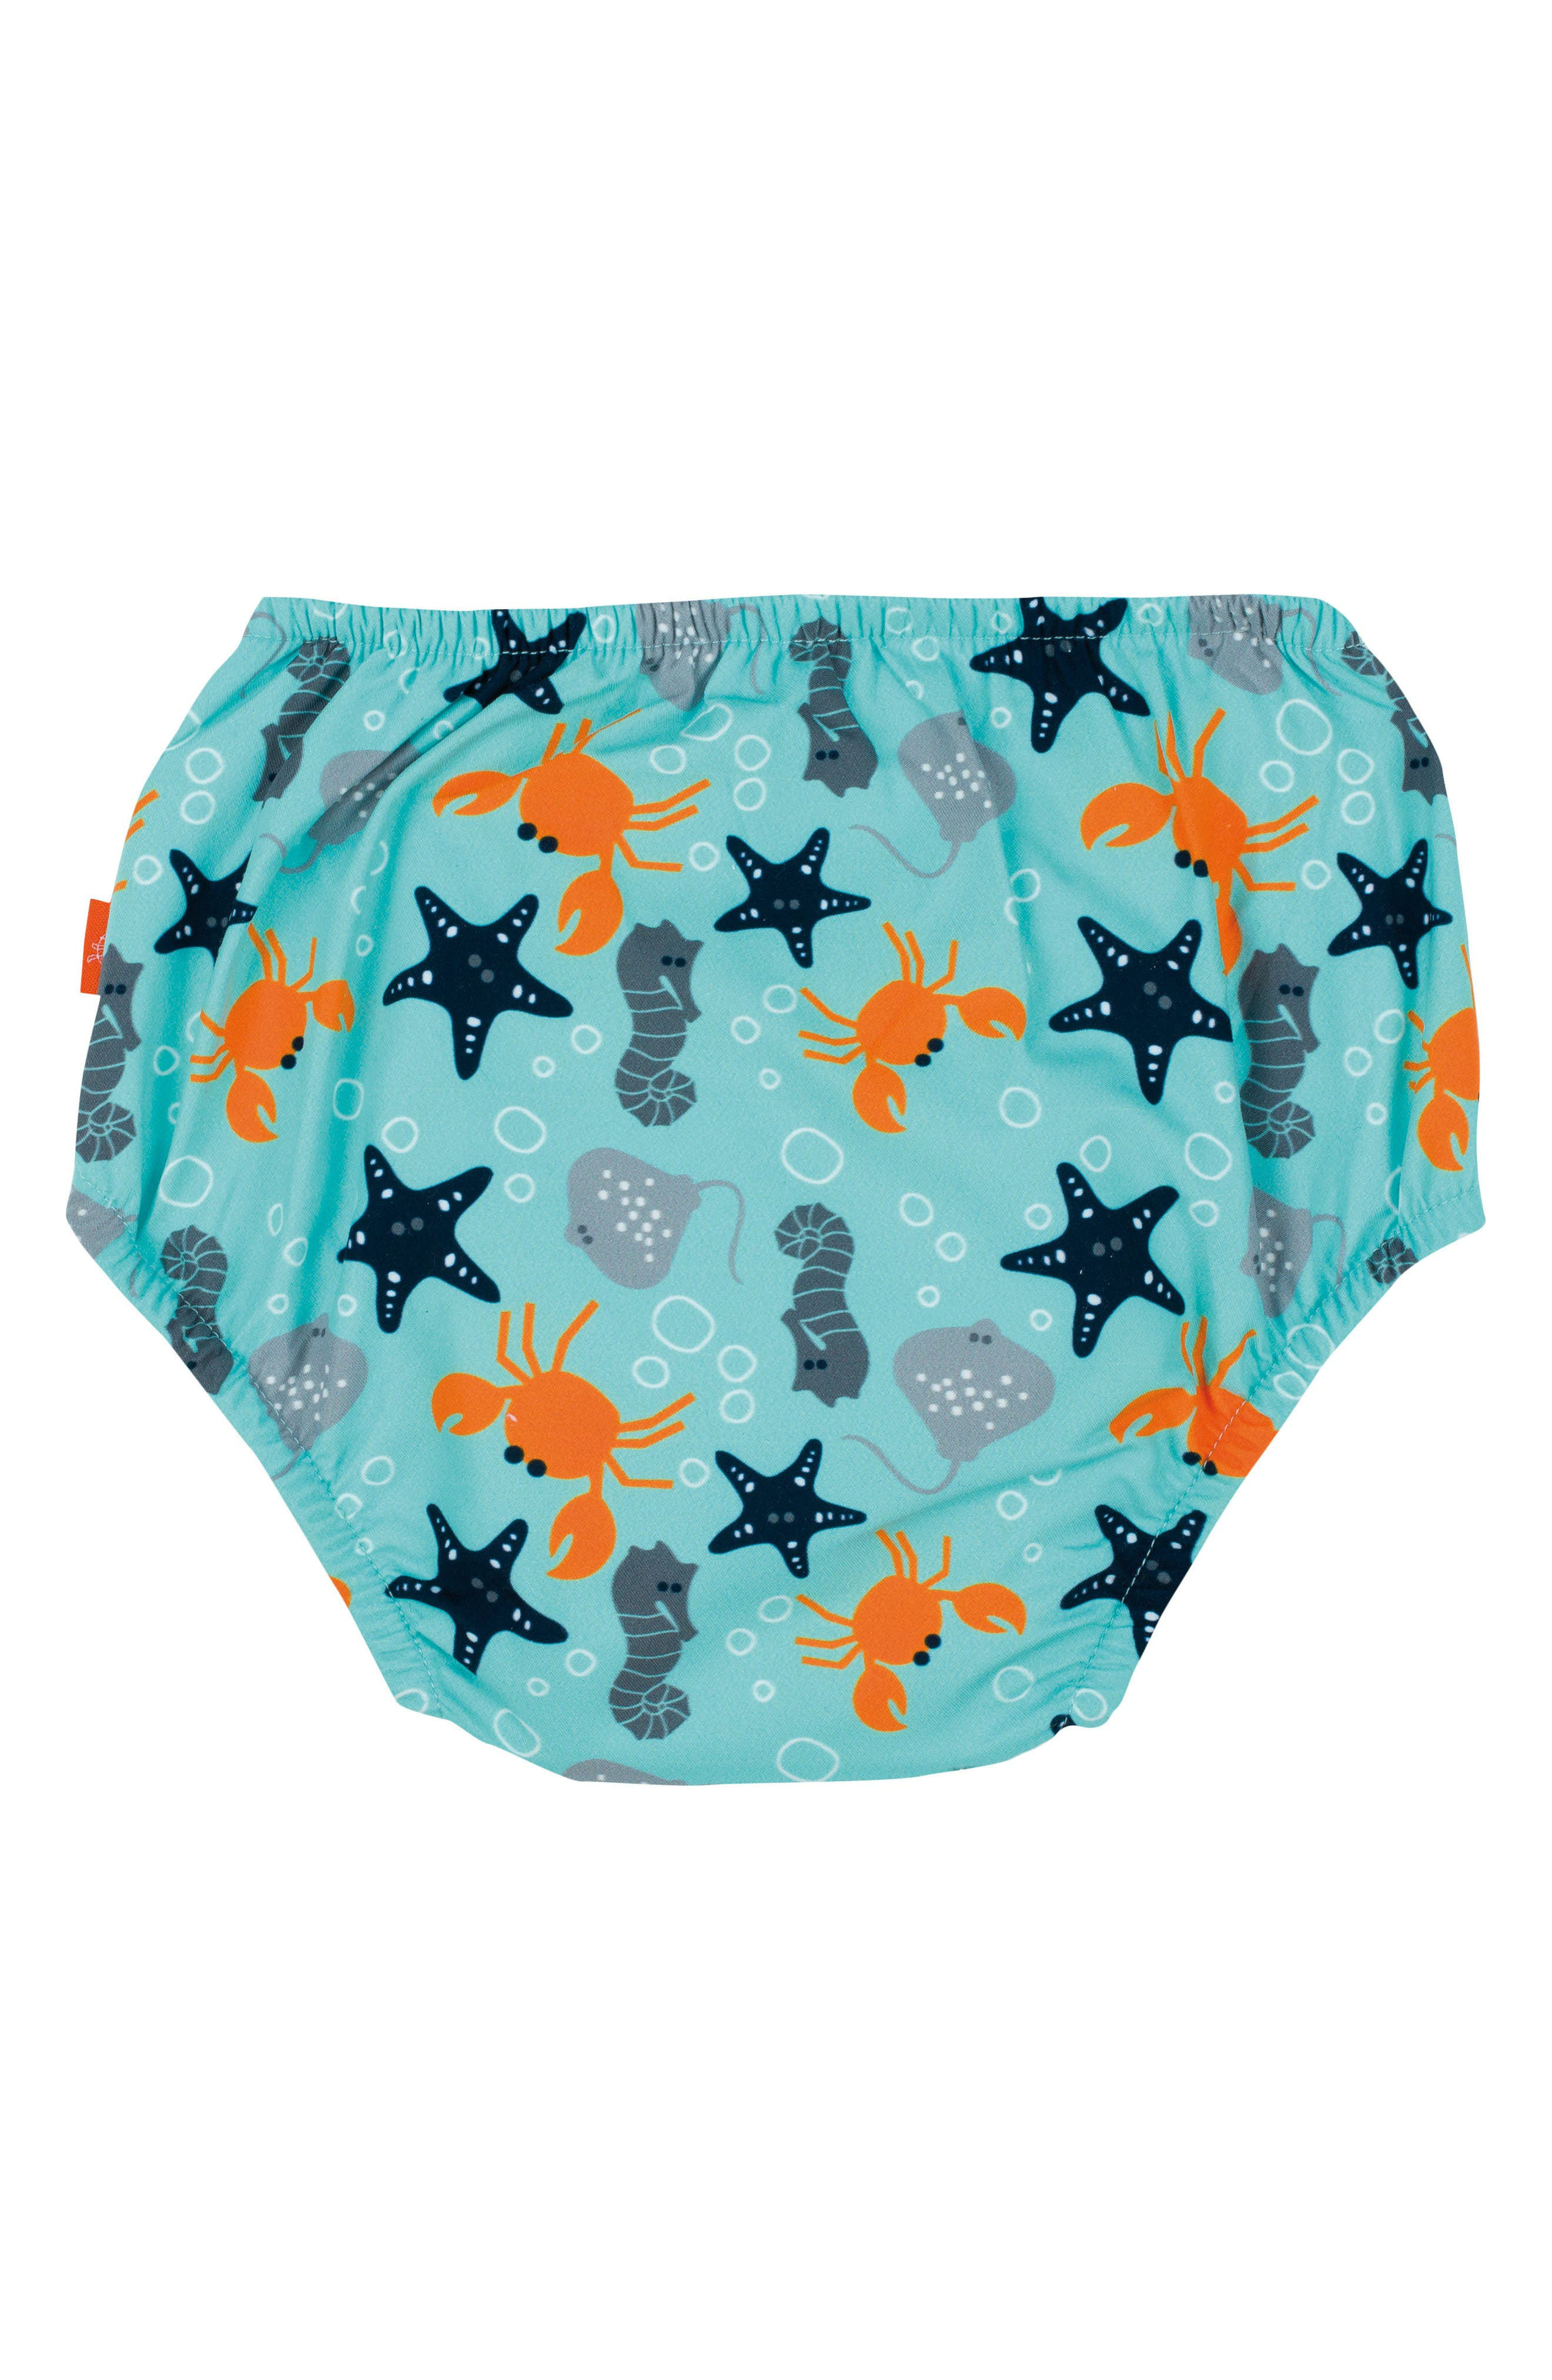 Star Fish Swim Diaper Cover,                             Alternate thumbnail 2, color,                             400